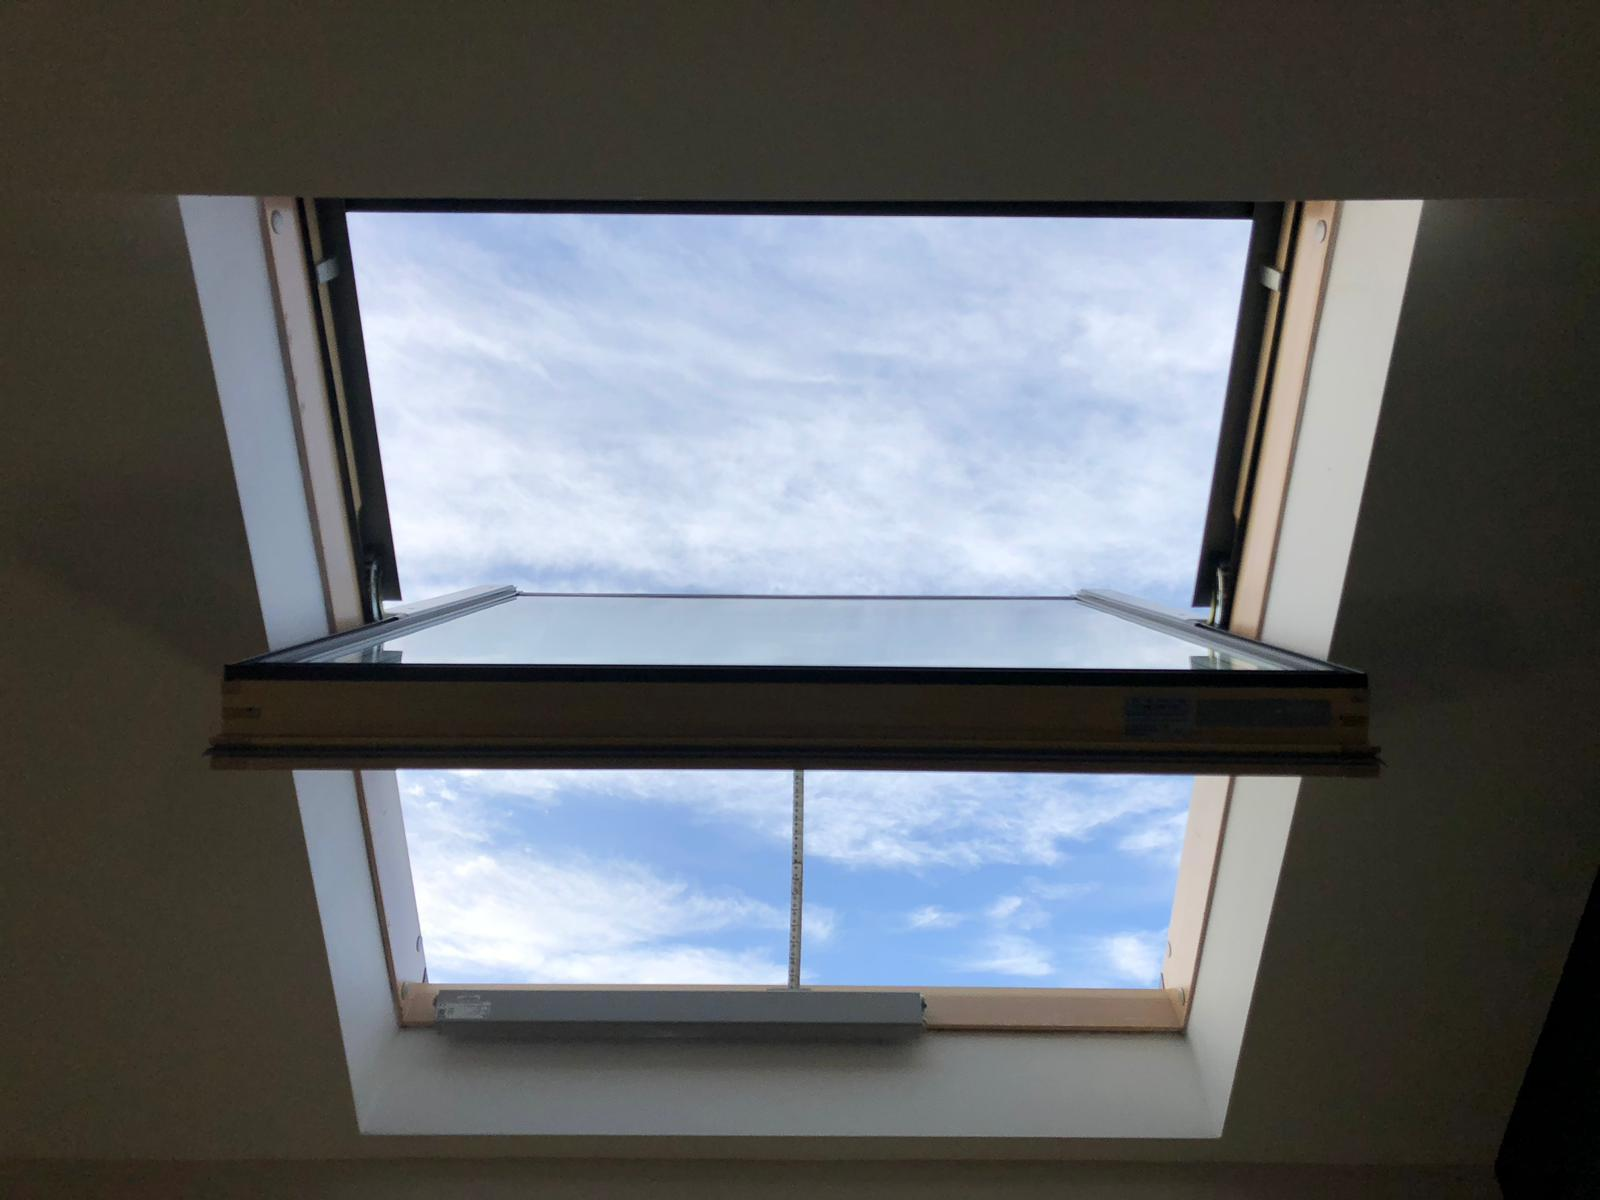 Smoke ventilation window in action